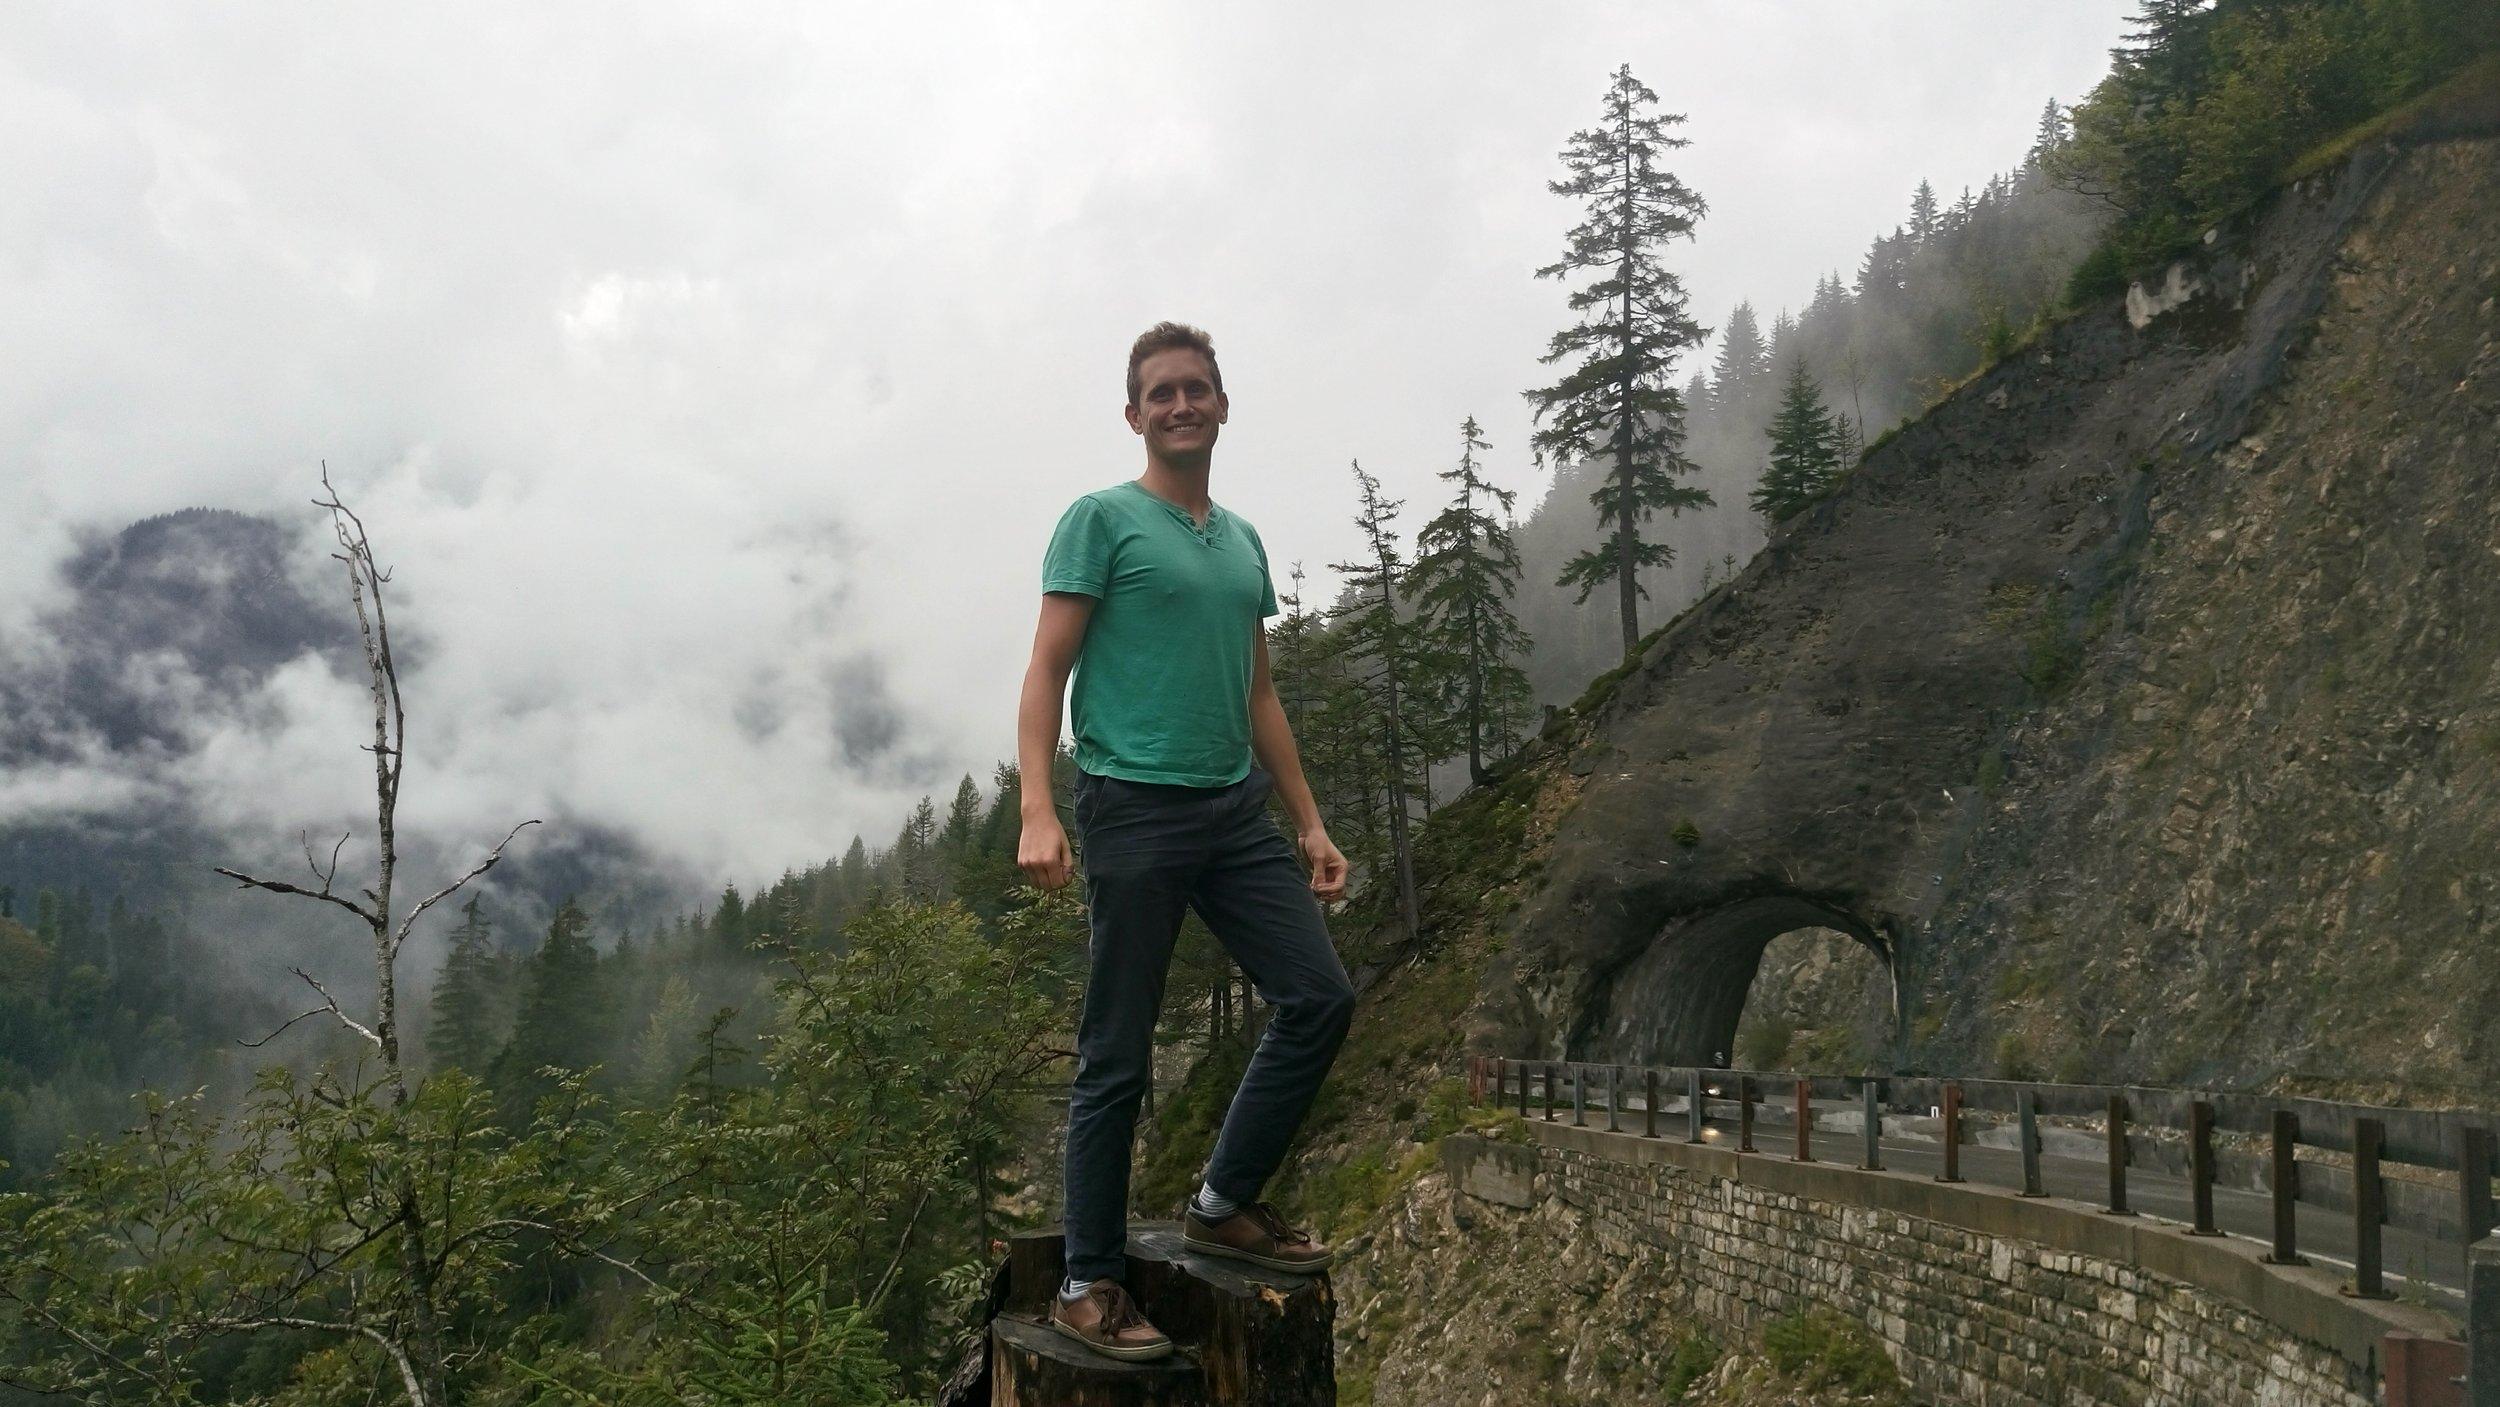 Road trip in Austria's Tyrol region